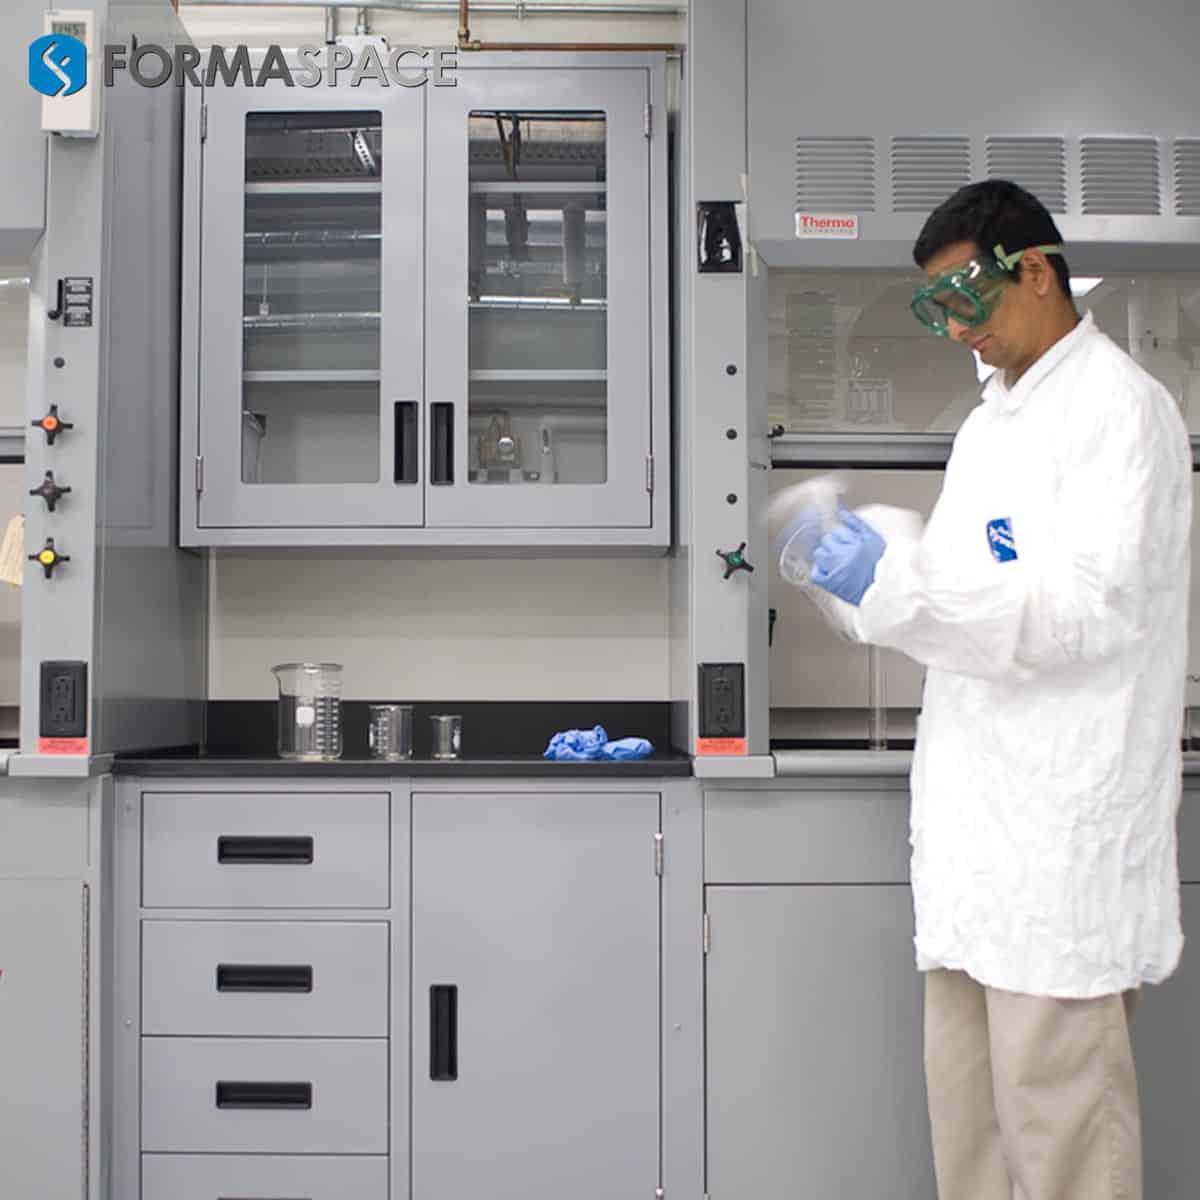 sample processing casework with fumehood